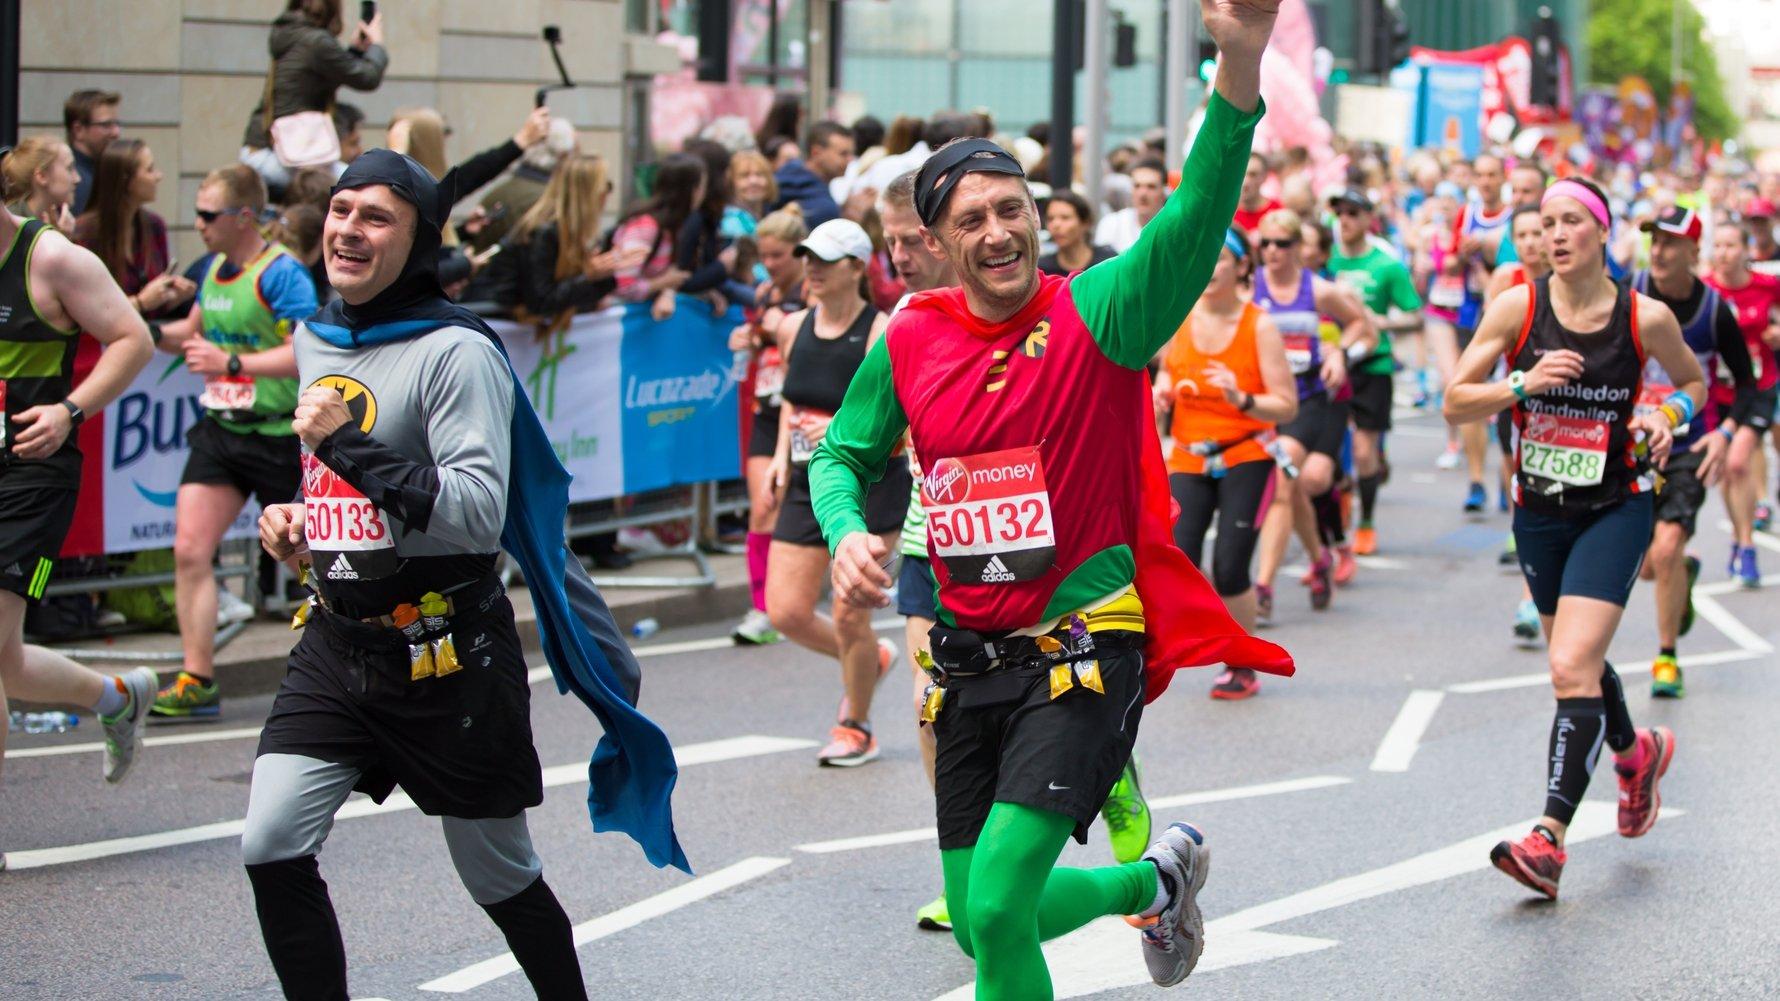 © IR Stone Shutterstock.com Marathon